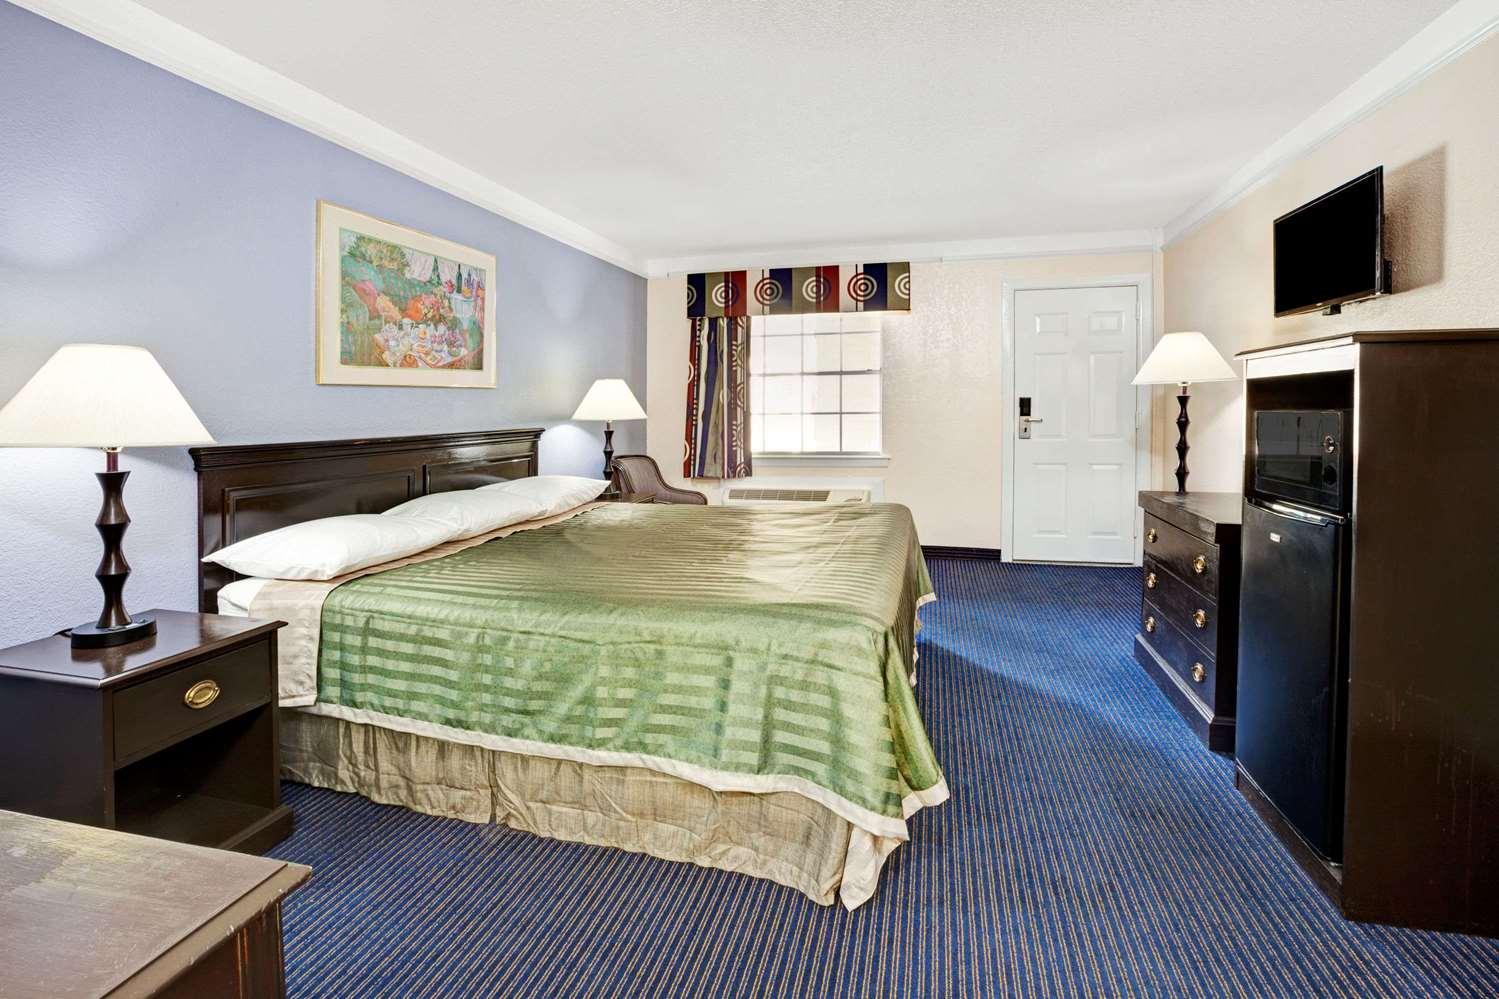 Room - Travelodge Northwest Richland Hills